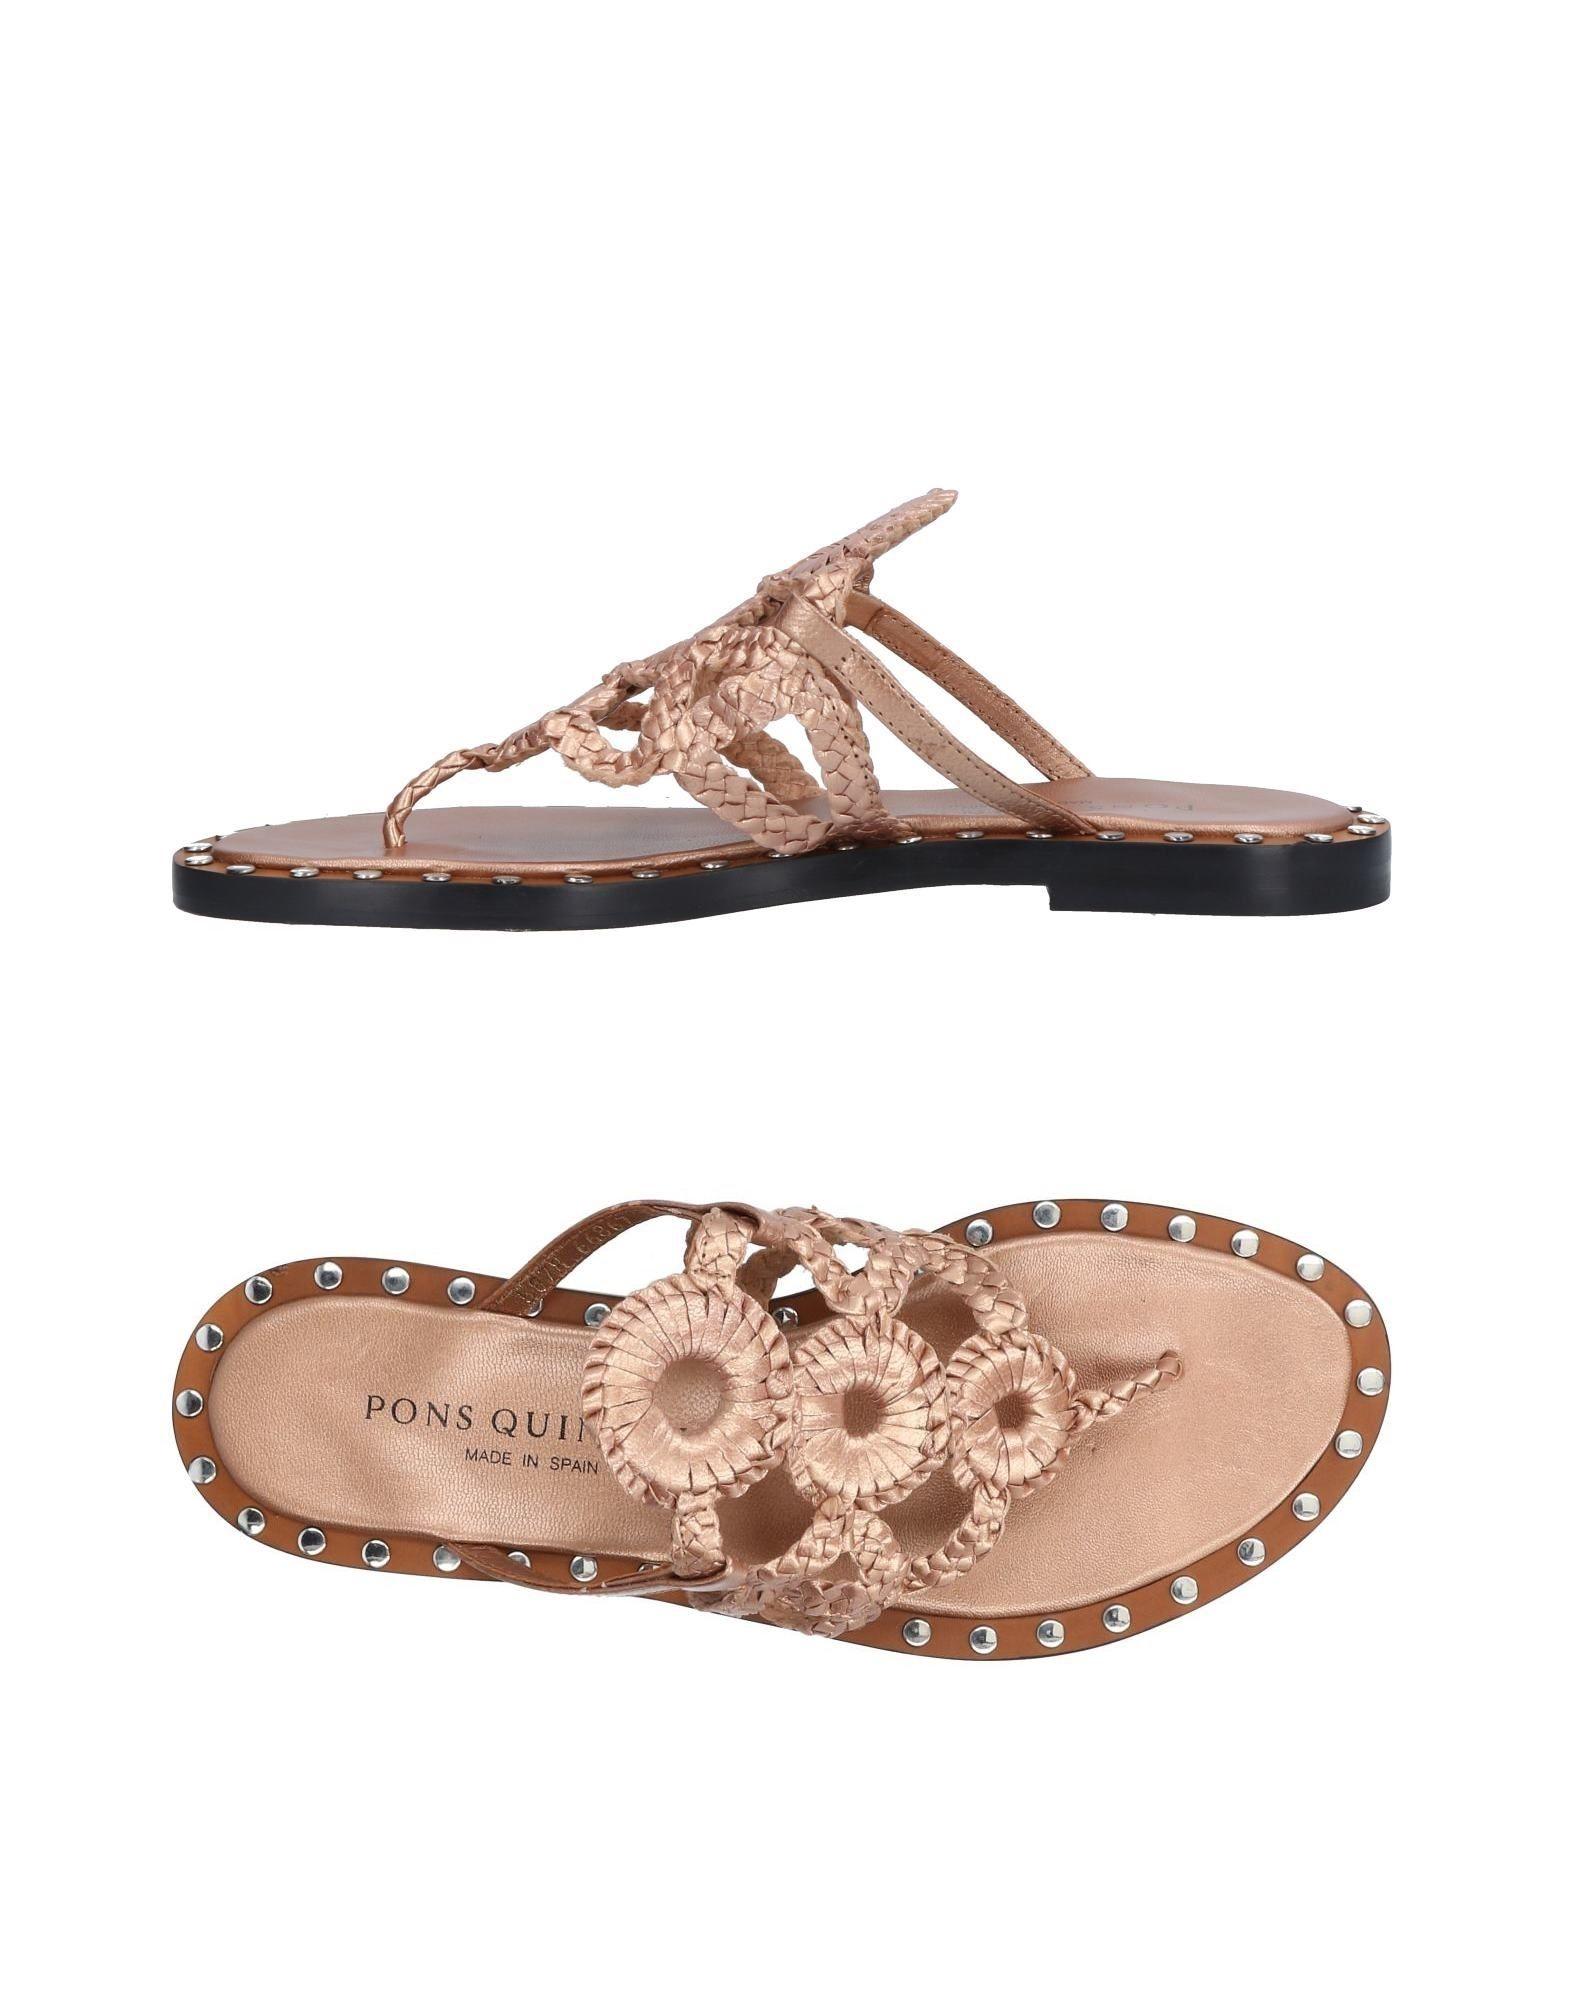 Pons Quintana Dianetten Damen  11433877IH Gute Qualität beliebte Schuhe